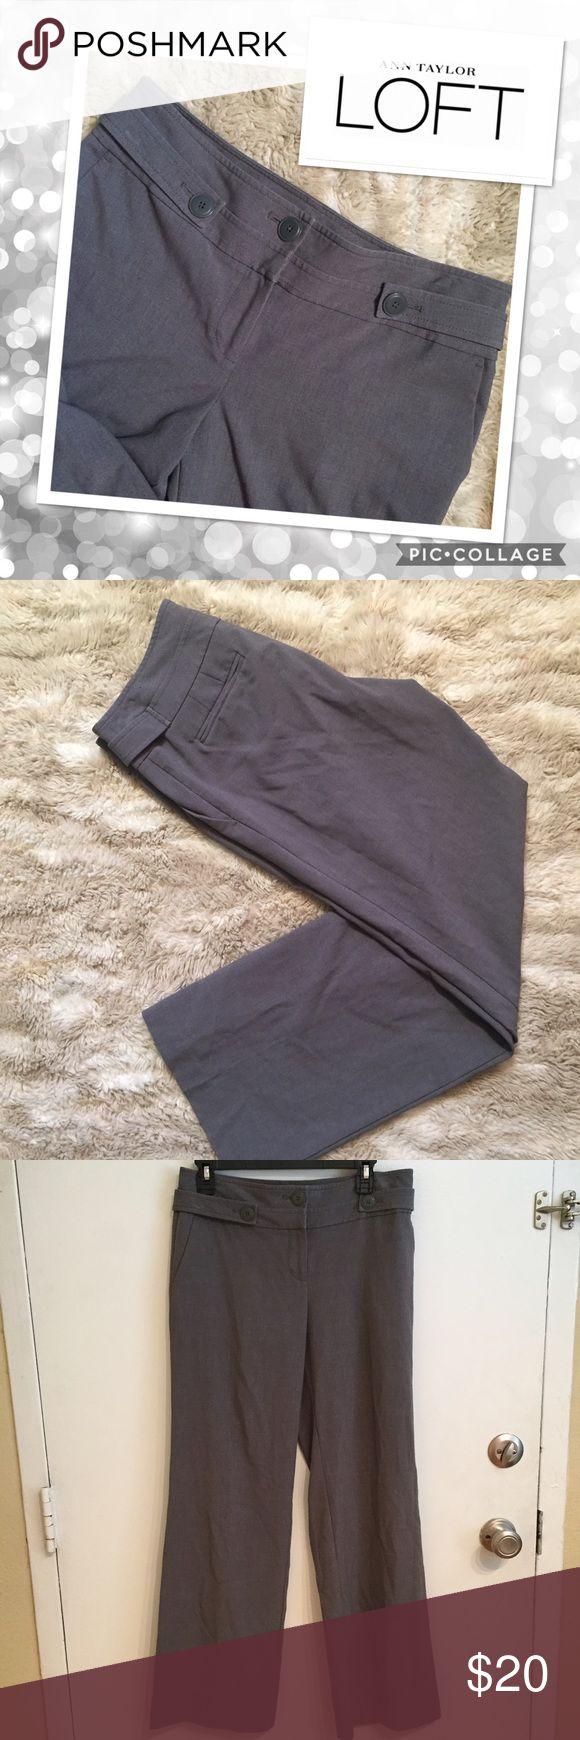 "🐣5for$25🐣Ann Taylor LOFT Grey Side Button Slacks Ann Taylor LOFT grey side Button detail dress slack pants. Size 4. Measures 15.5"" flat at waist, 31"" inseam, and 10.5"" leg opening. #anntaylor #loft #anntaylorloft #grey #button #gray #slacks #pants #trousers #interview #businesscasual #punkydoodle  No modeling Smoke free home I do discount bundles LOFT Pants"